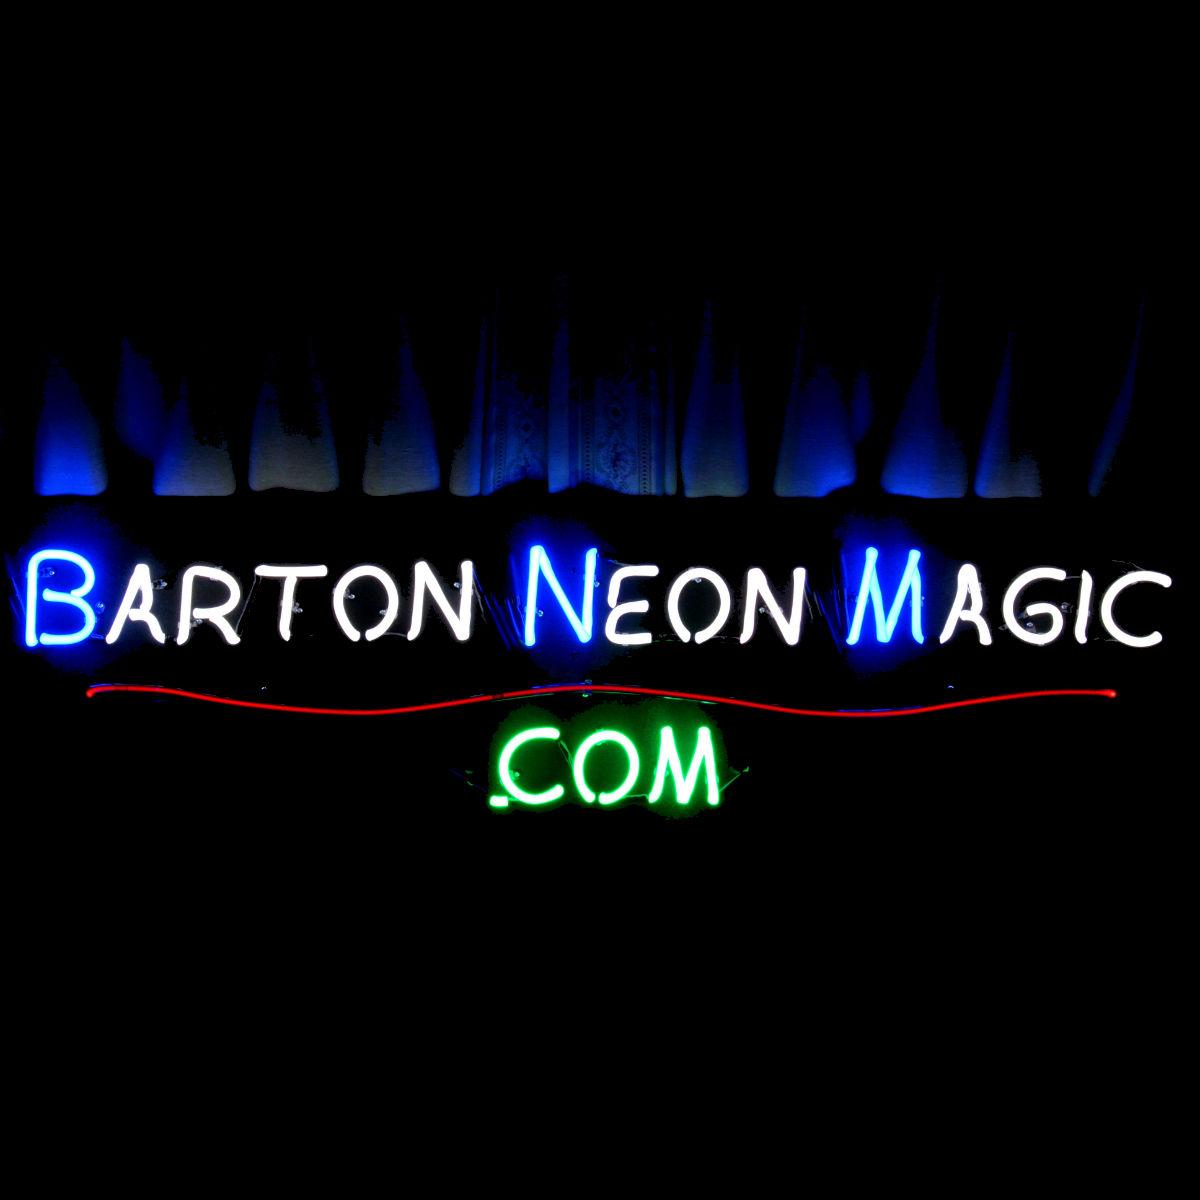 Brilliant Designer Custom Neon Light Fixtures by John Barton - BartonNeonMagic.com